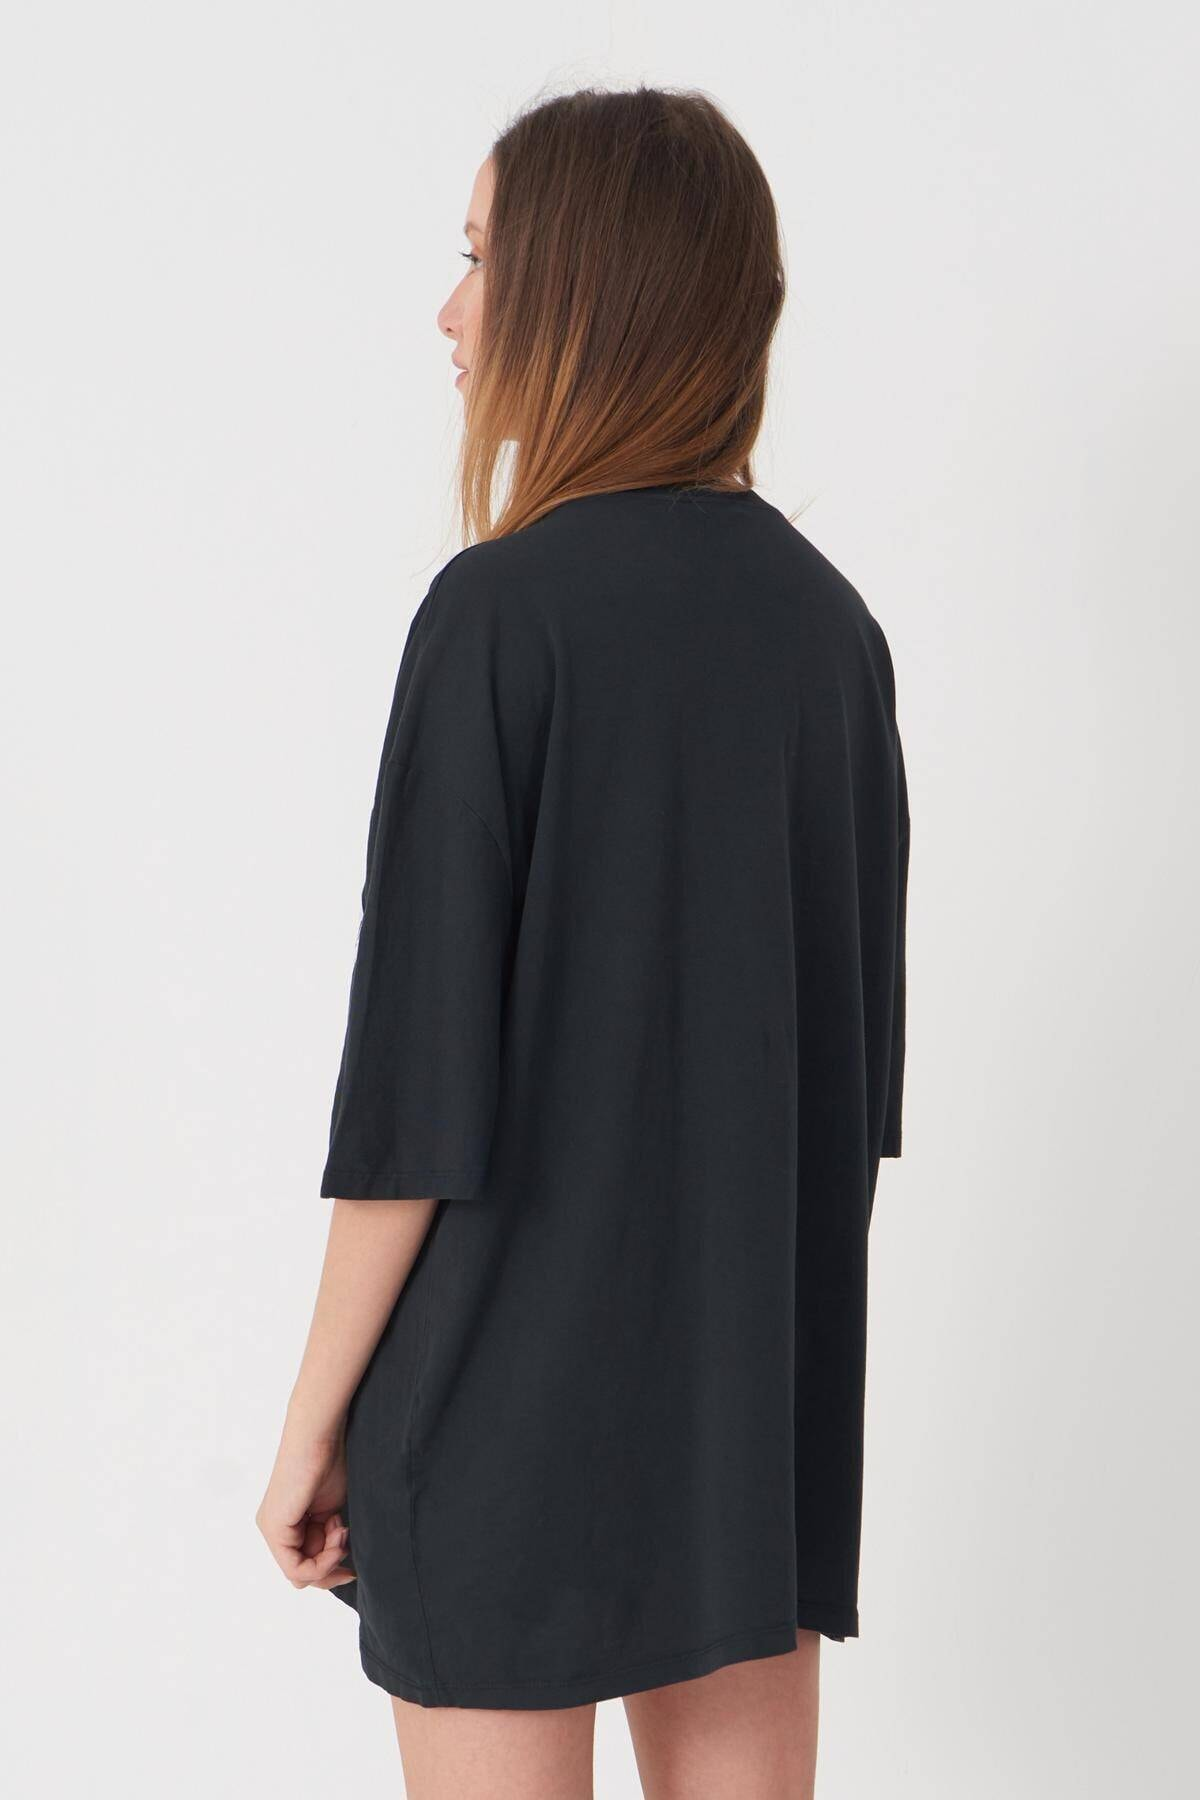 Addax Kadın Füme Baskılı T-Shirt P9371 - C5 Adx-0000021438 4